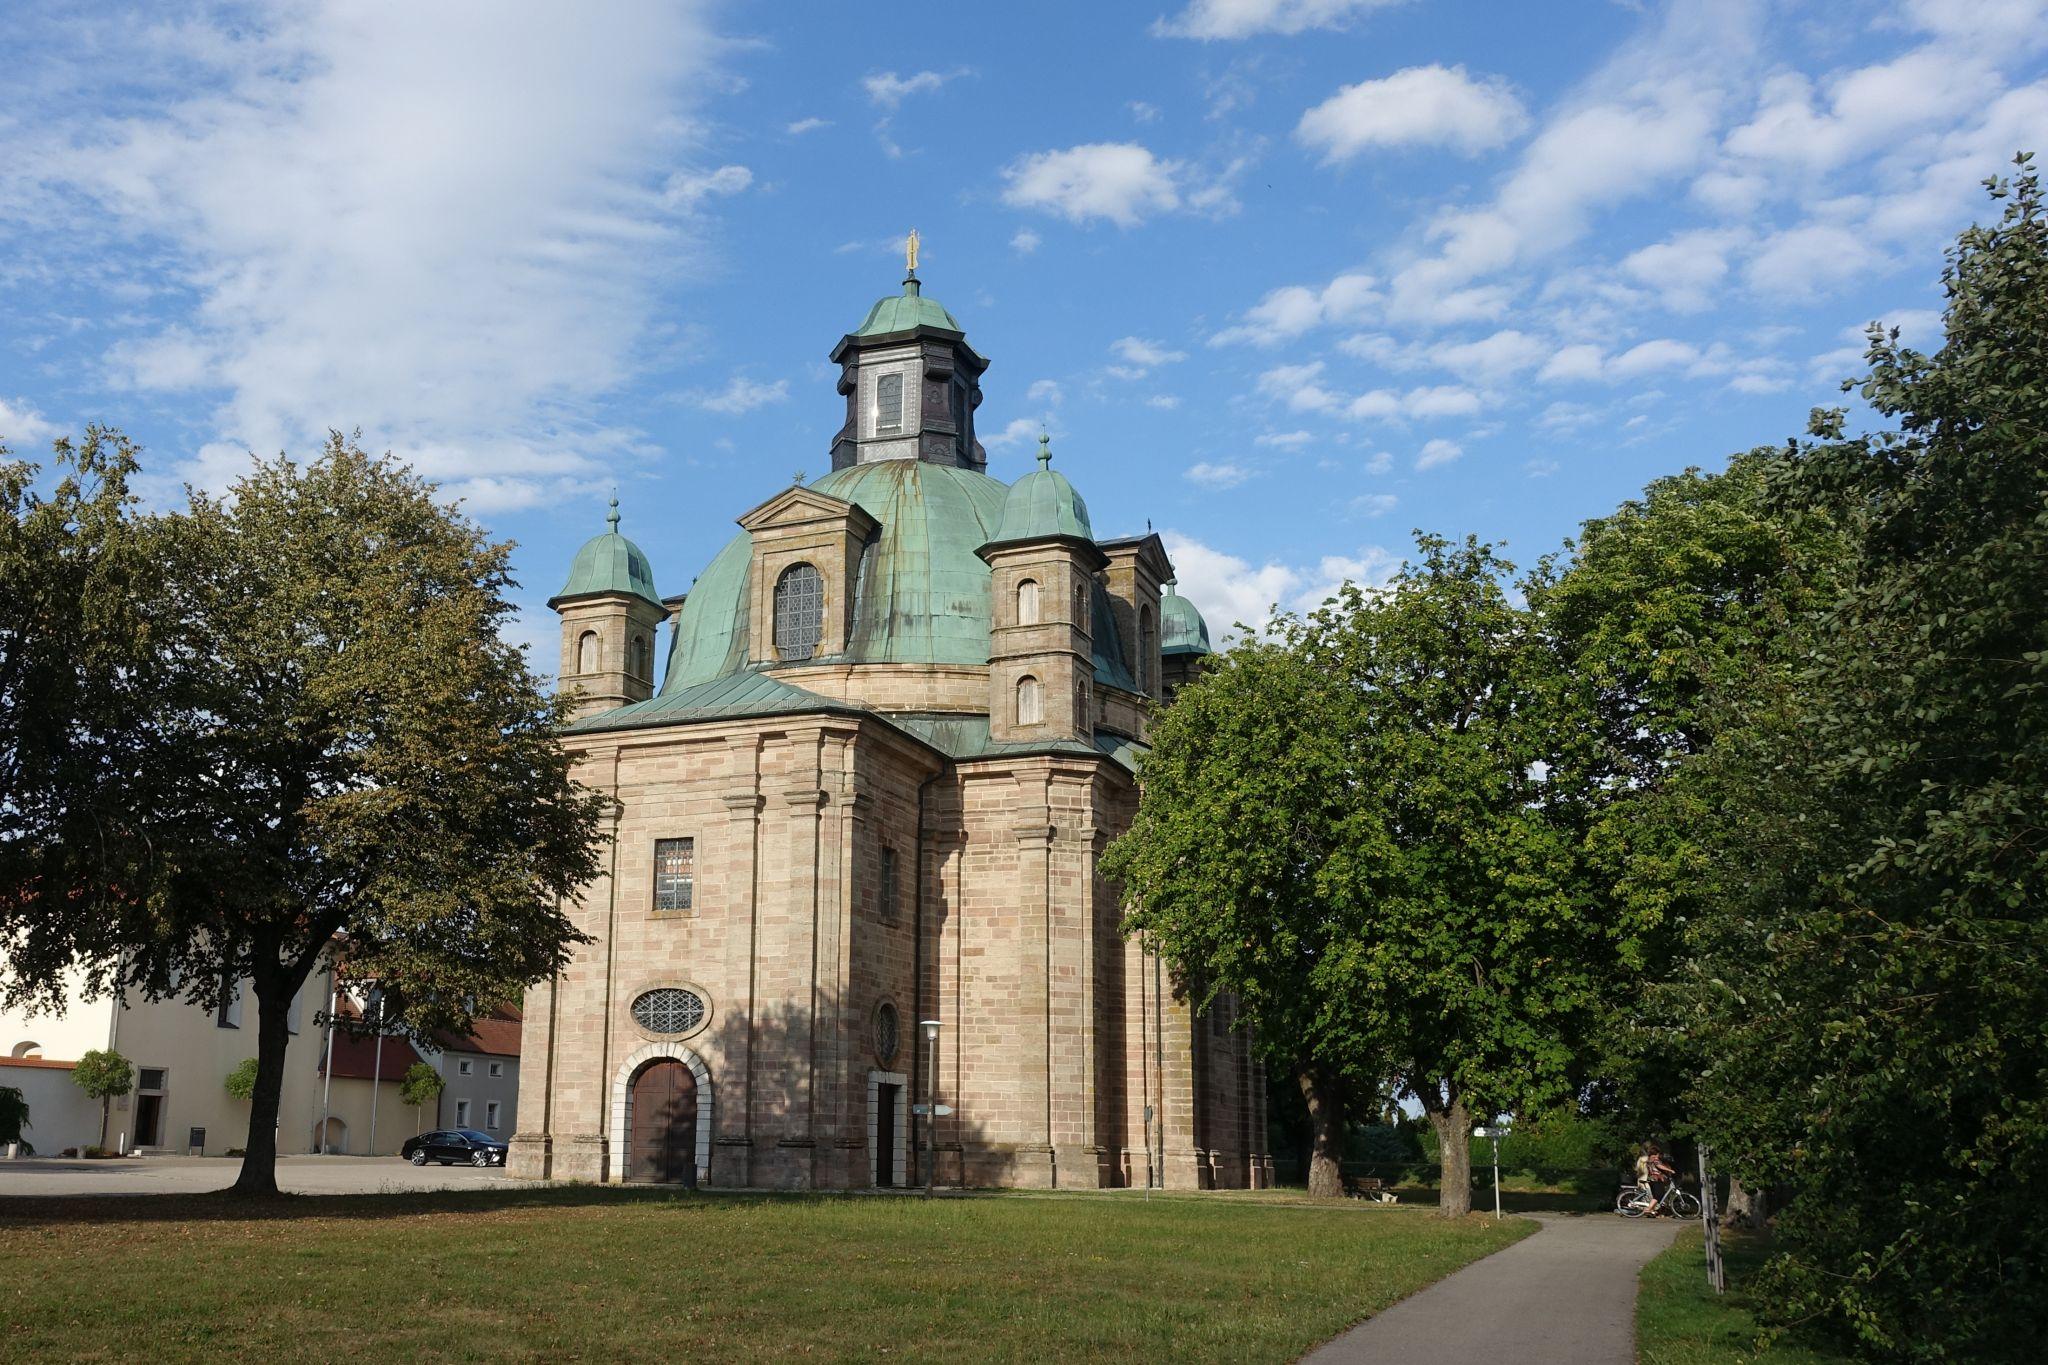 Wallfahrtskirche Mariahilf, Germany